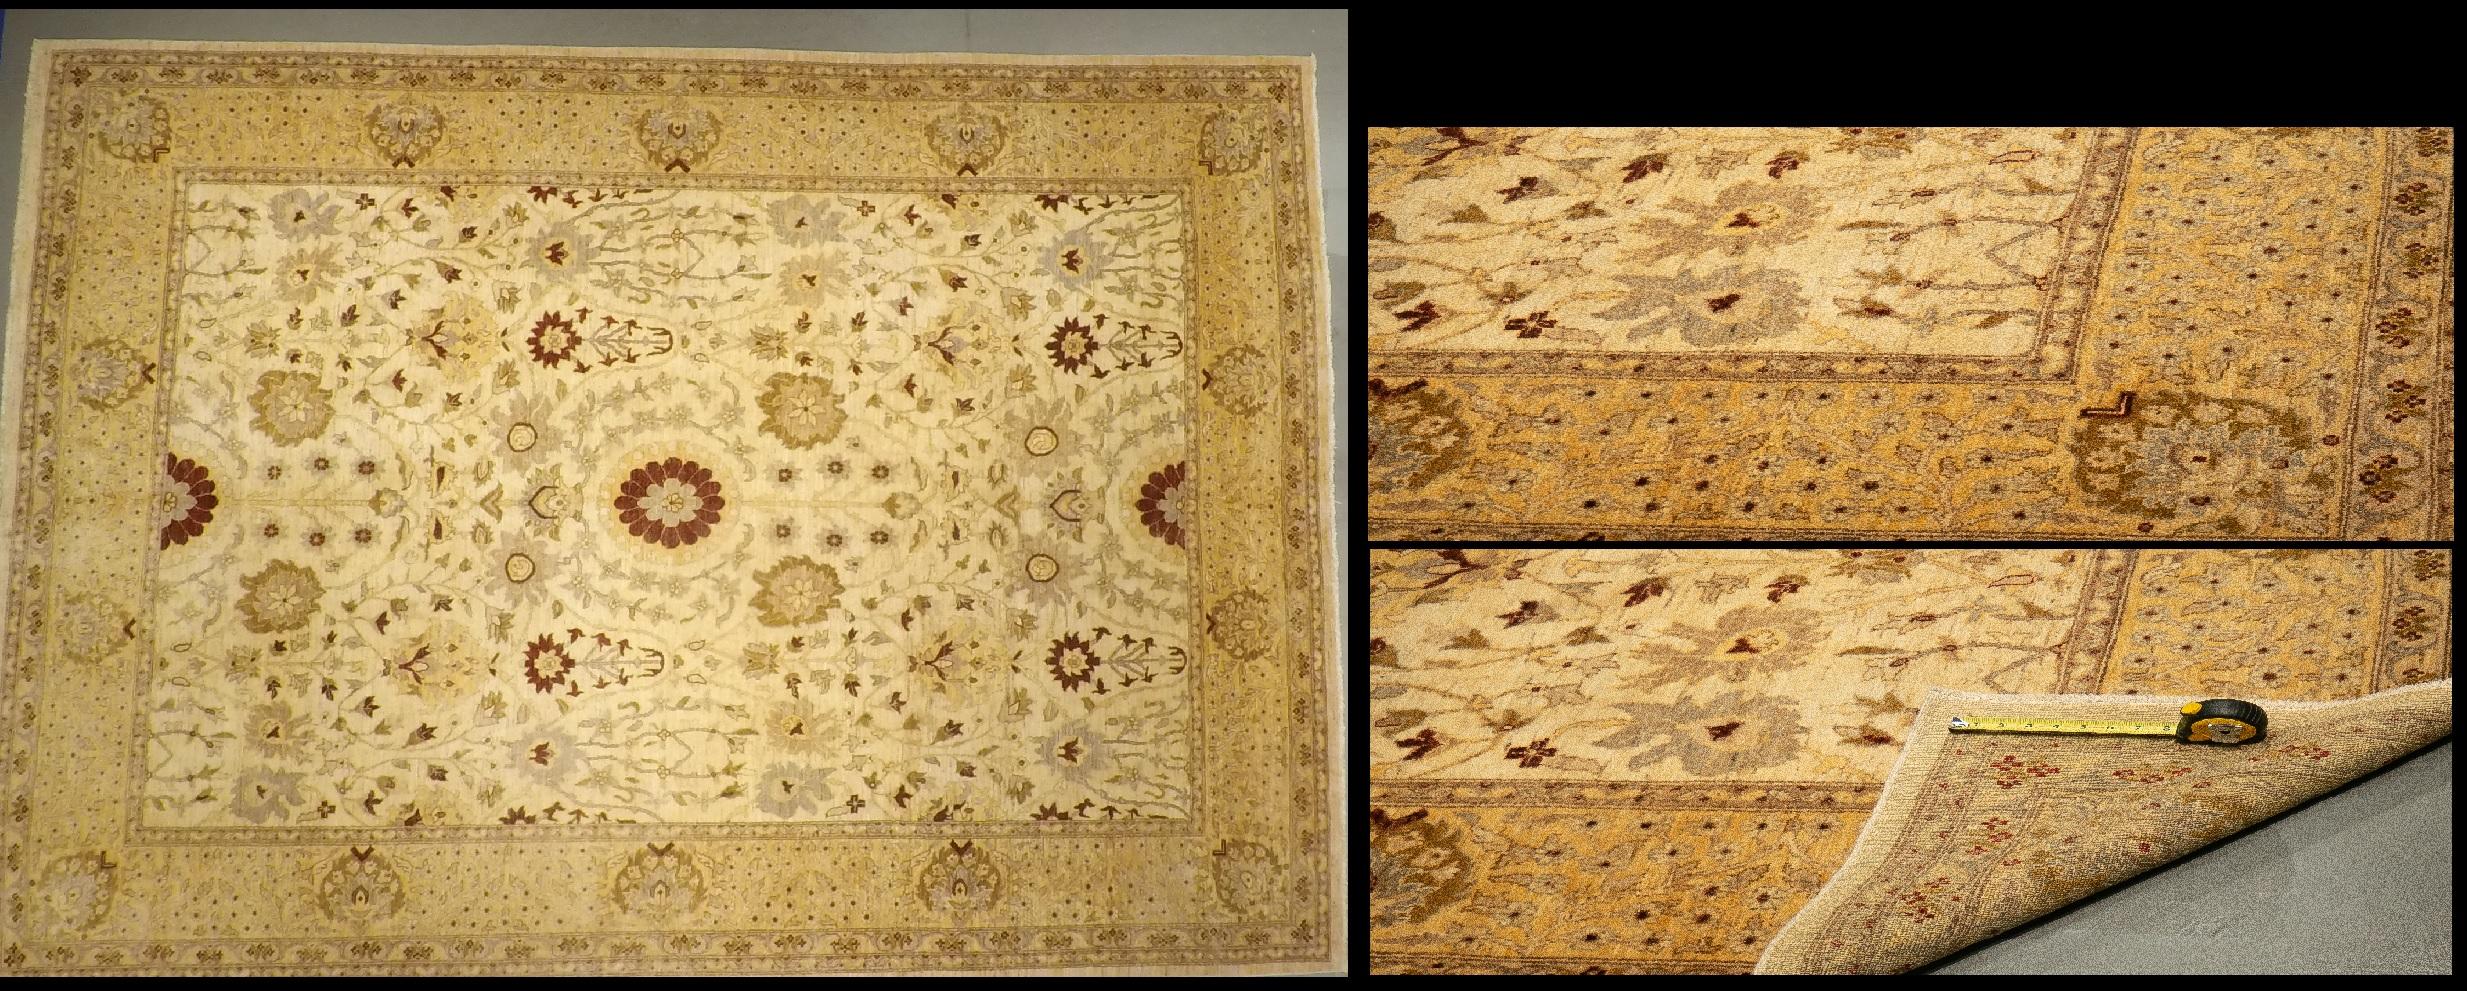 LD4 3660 (11.8 x 12) Wool-Handmade